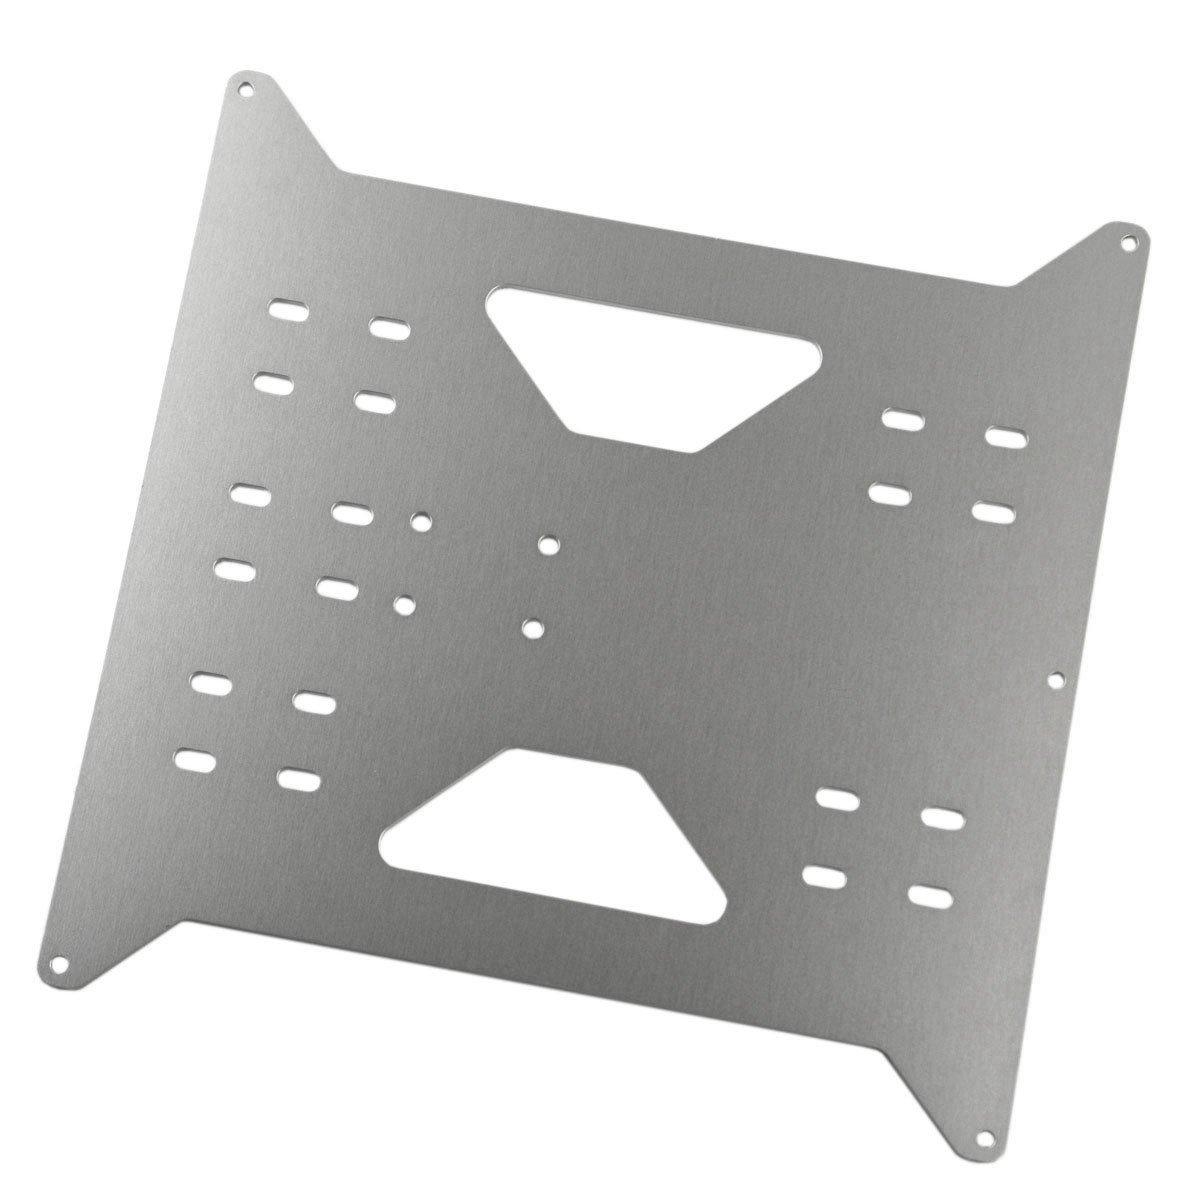 [Gulfcoast Robotics] Y Carriage Plate Upgrade for Maker Select and Wanhao Duplicatior i3 3D Printers